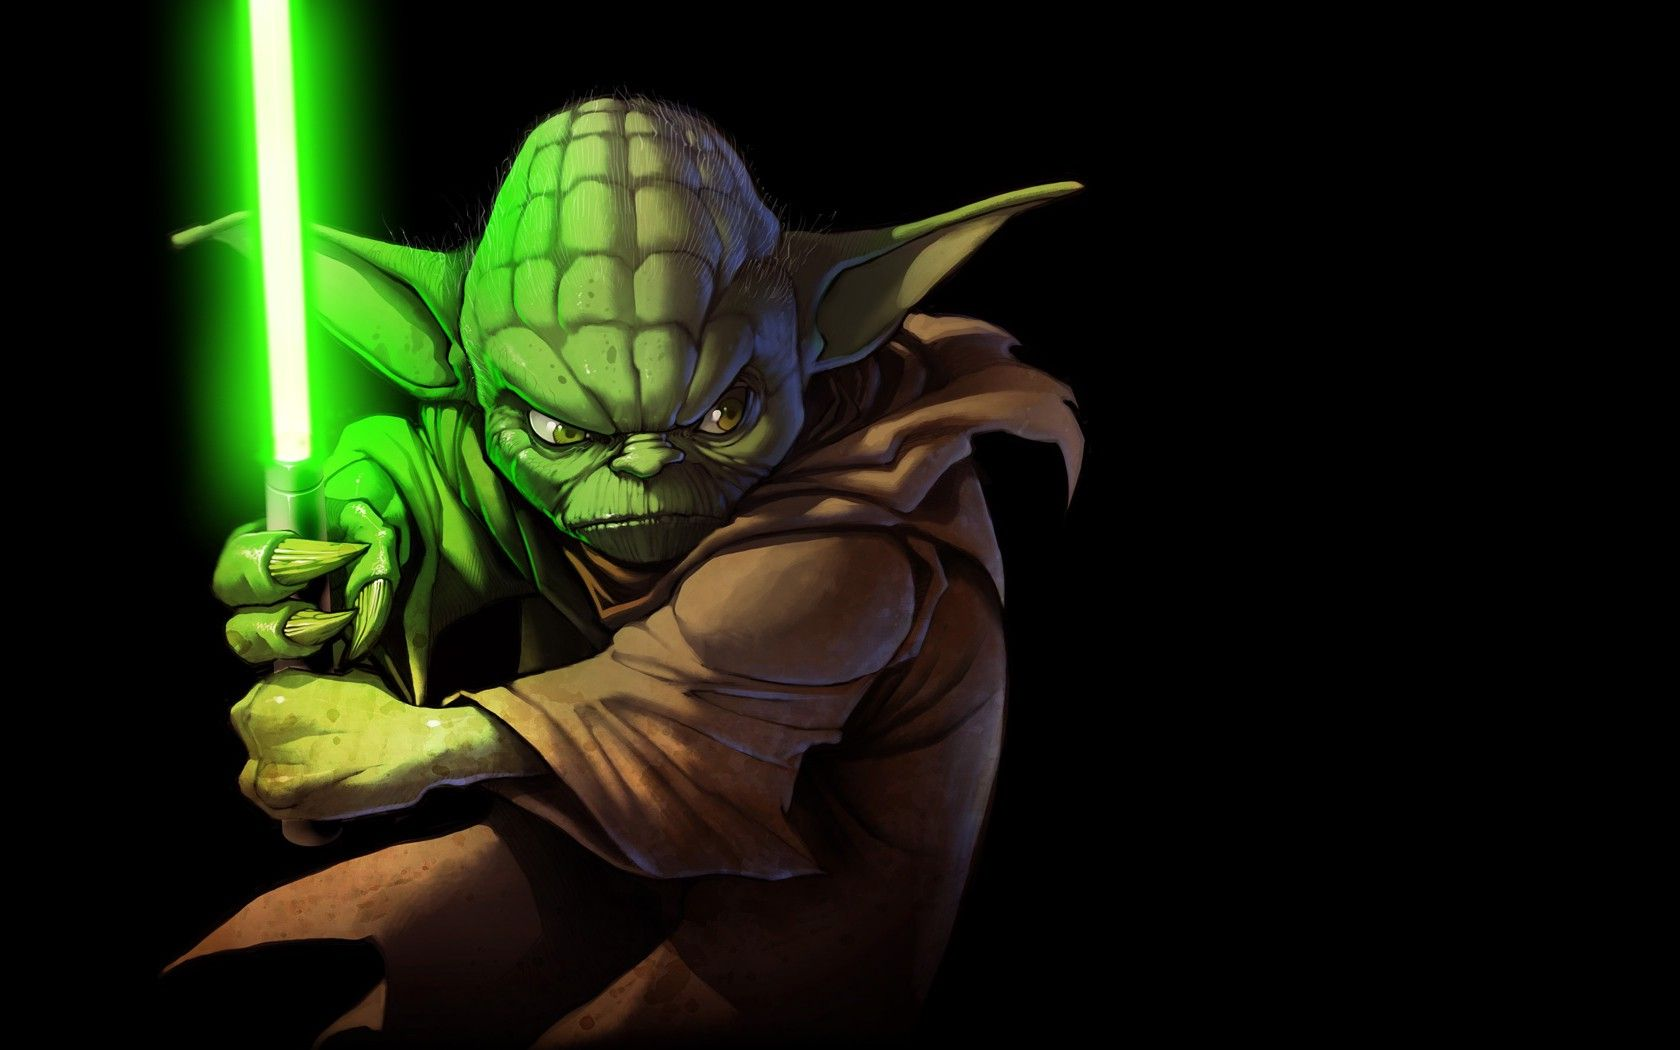 Download Hd Wallpapers Of 108130 Yoda Star Wars Lightsaber Free Download High Yoda Wallpaper Star Wars Yoda Yoda